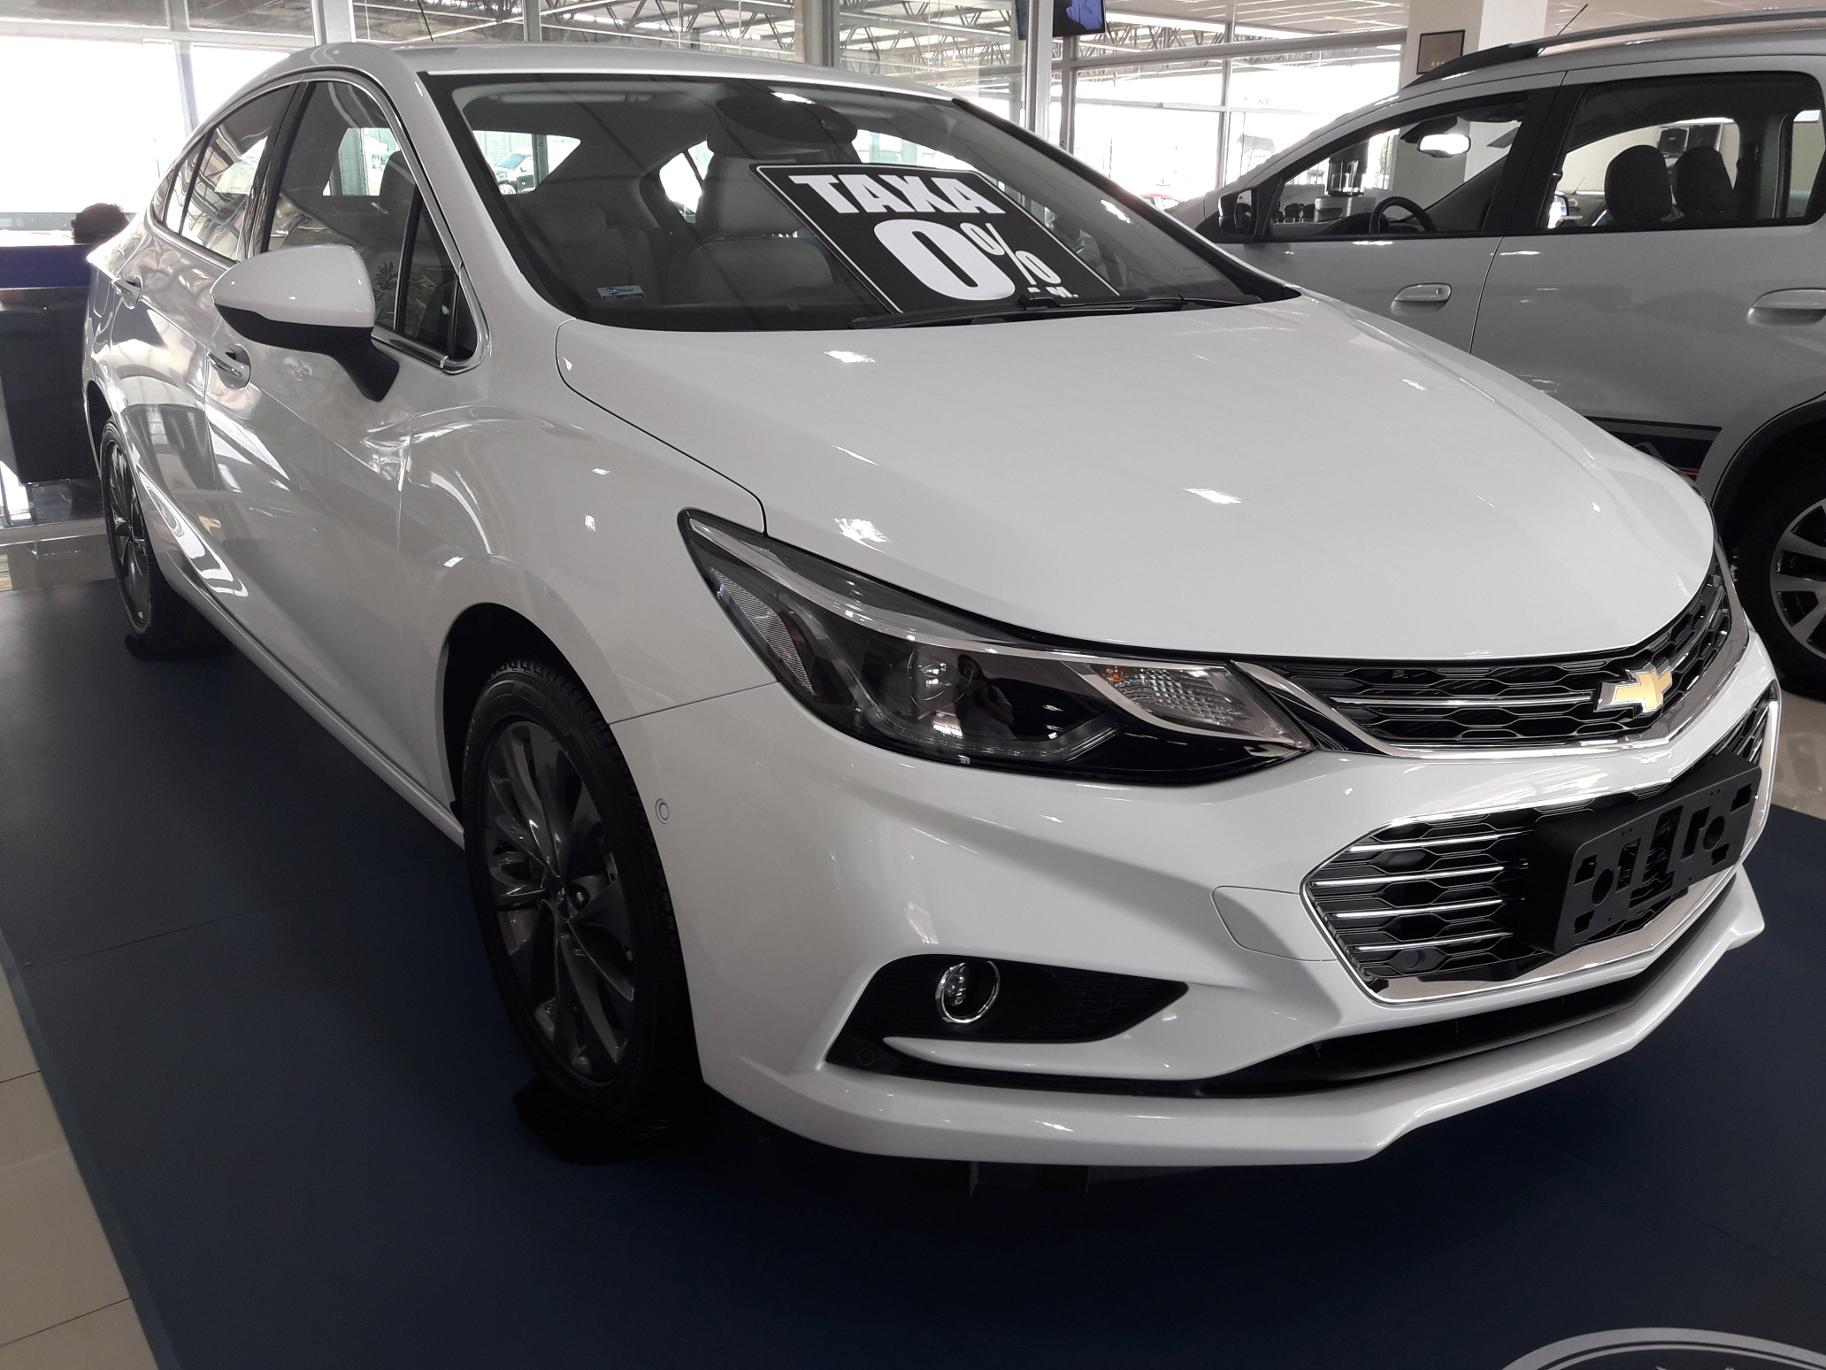 Chevrolet CRUZE LTZ 1.4L 2018